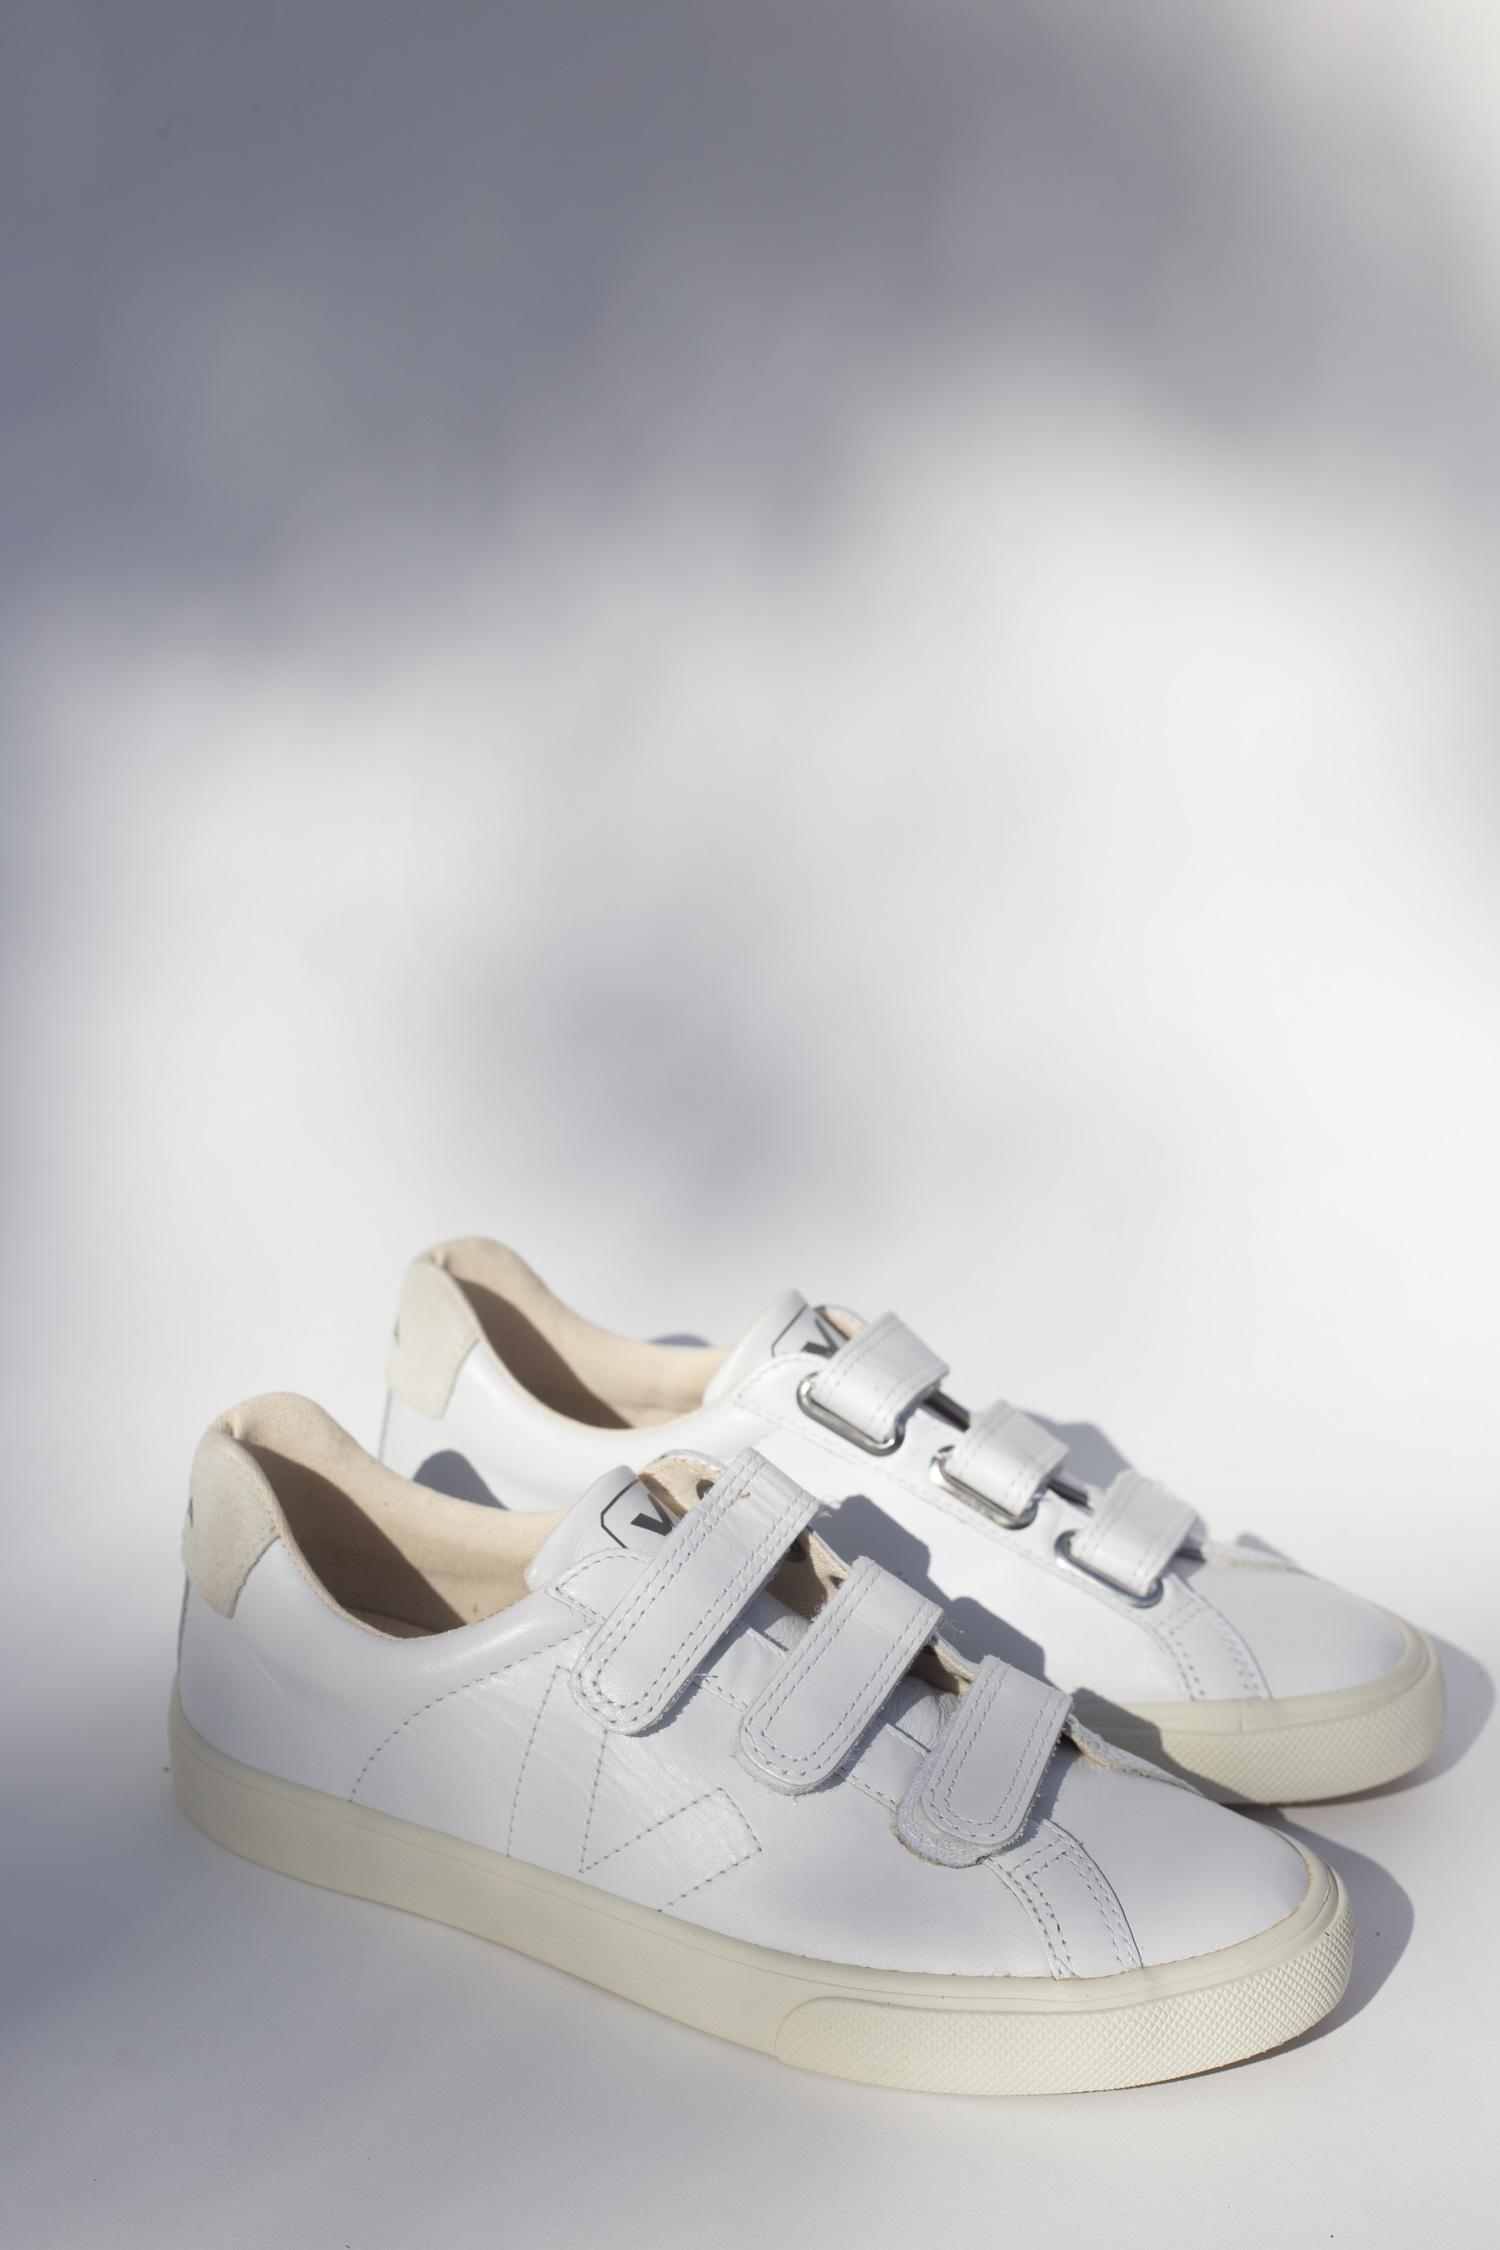 Skater classic   VEJA Sneakers from Lisa Says Gah $130